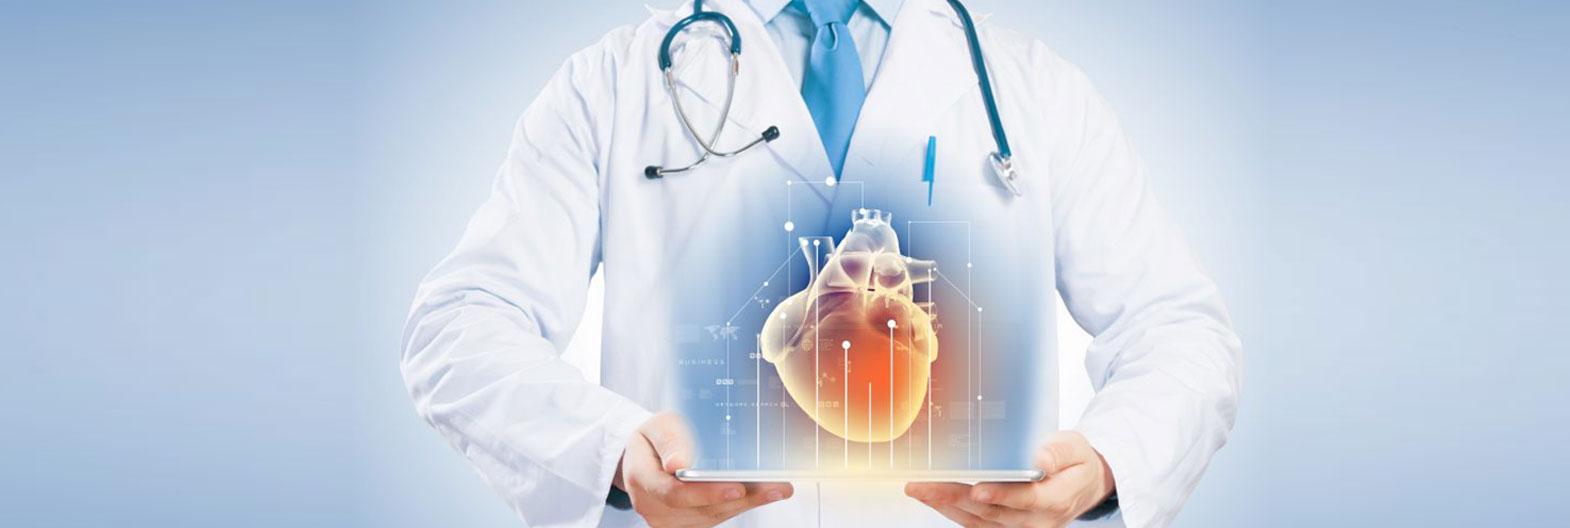 hipertenzija ir drebulys